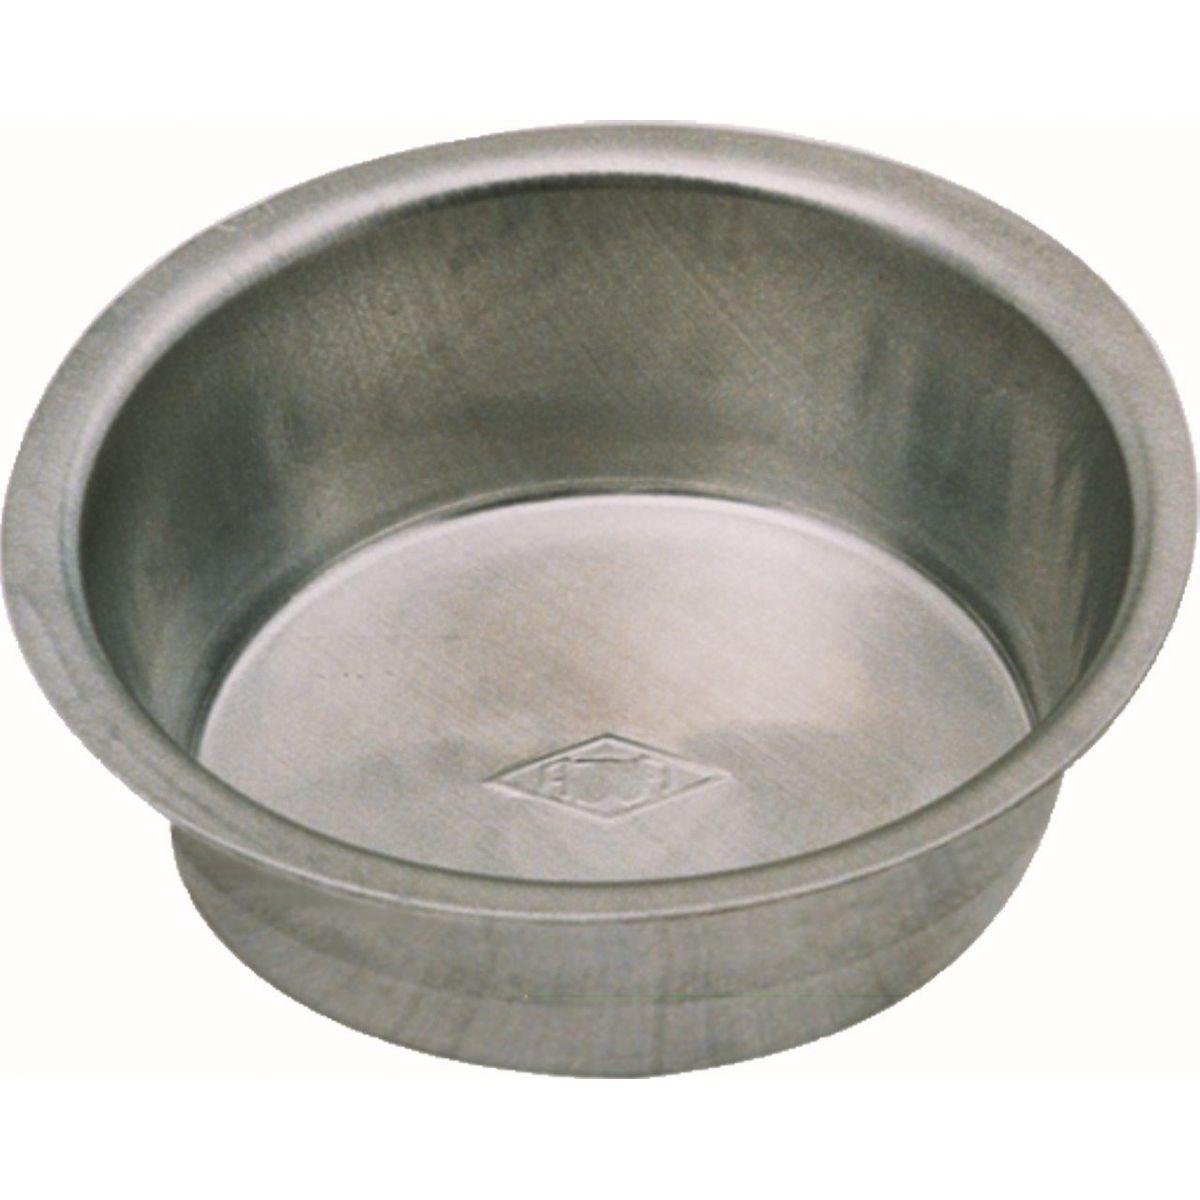 Forminha Redonda Lisa - 6.5 x 2 cm - C/12 Un. - Alumínio